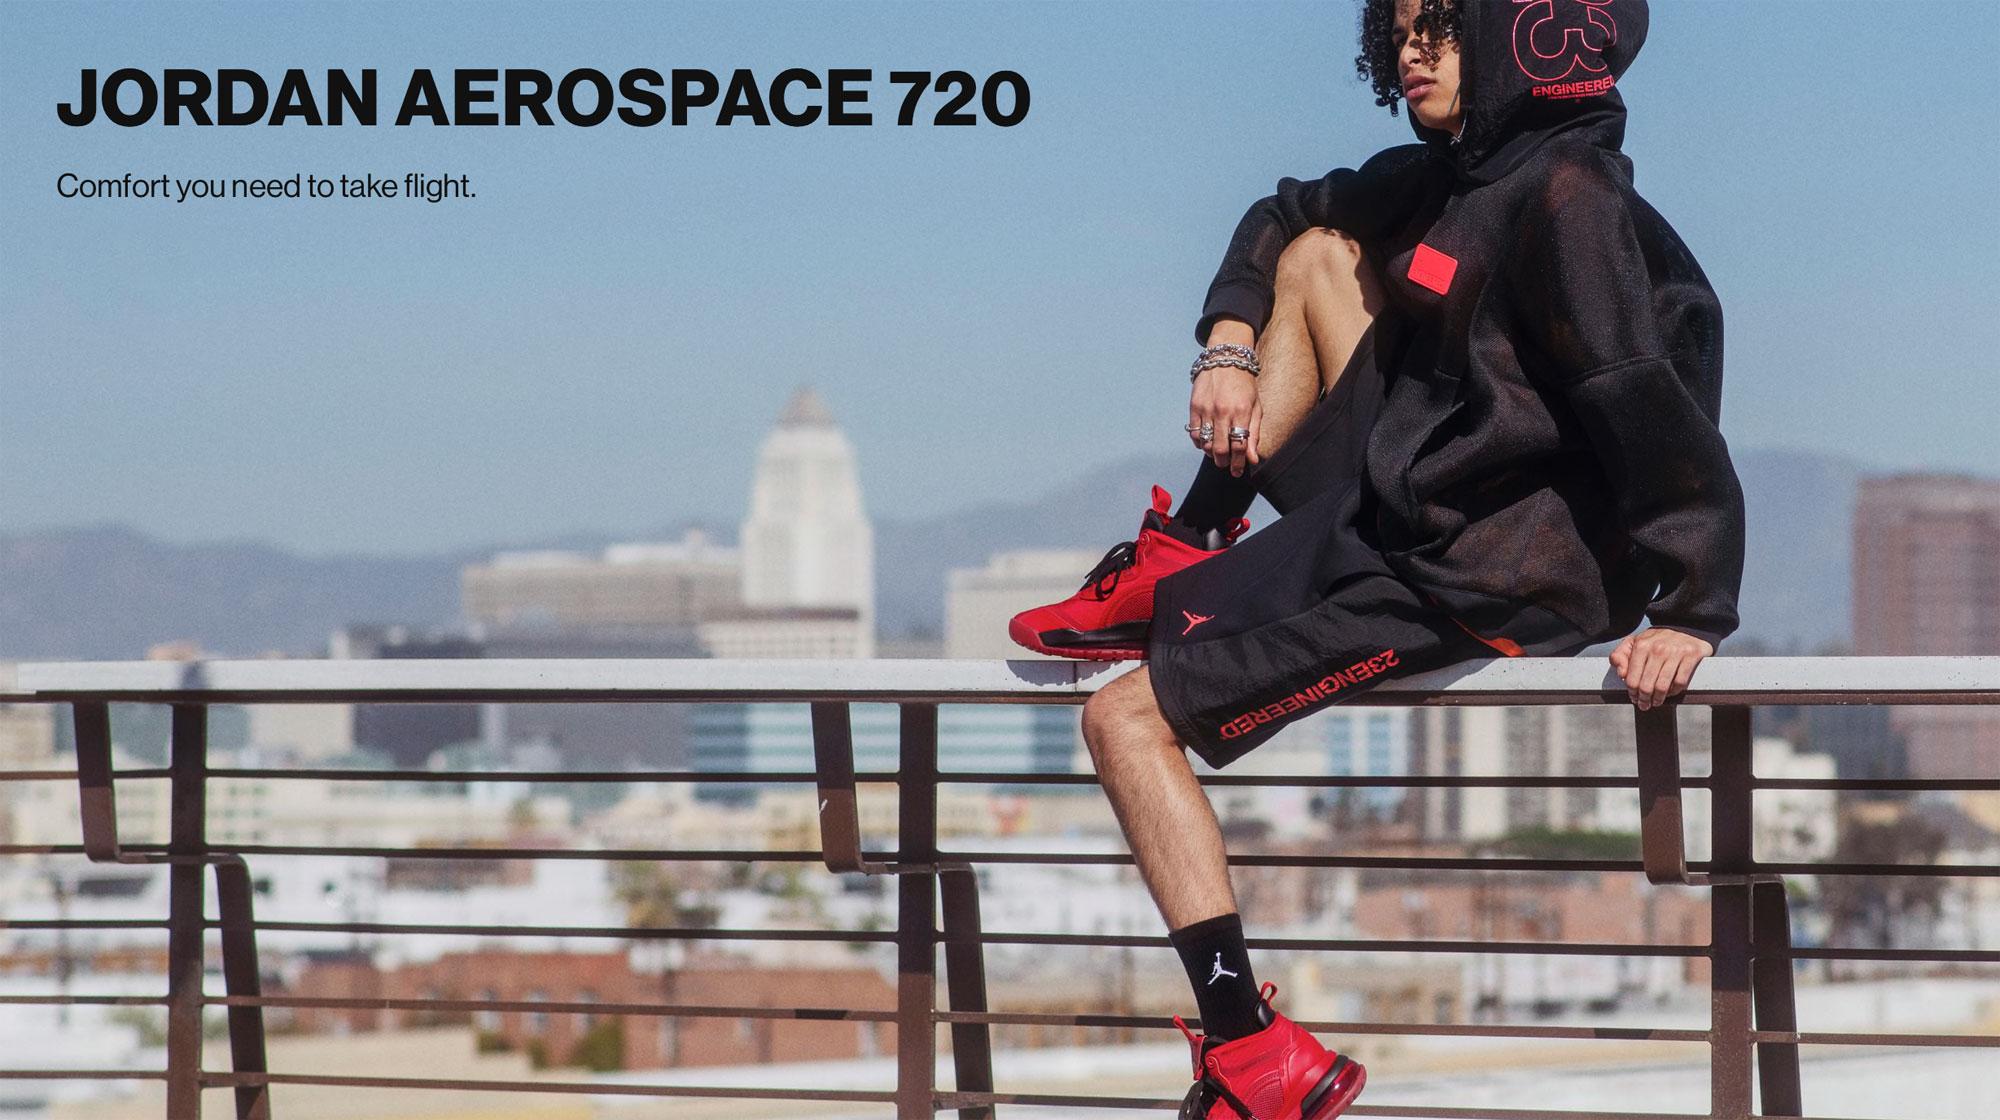 jordan-aerospace-720-raging-bull-gym-red-clothing-match